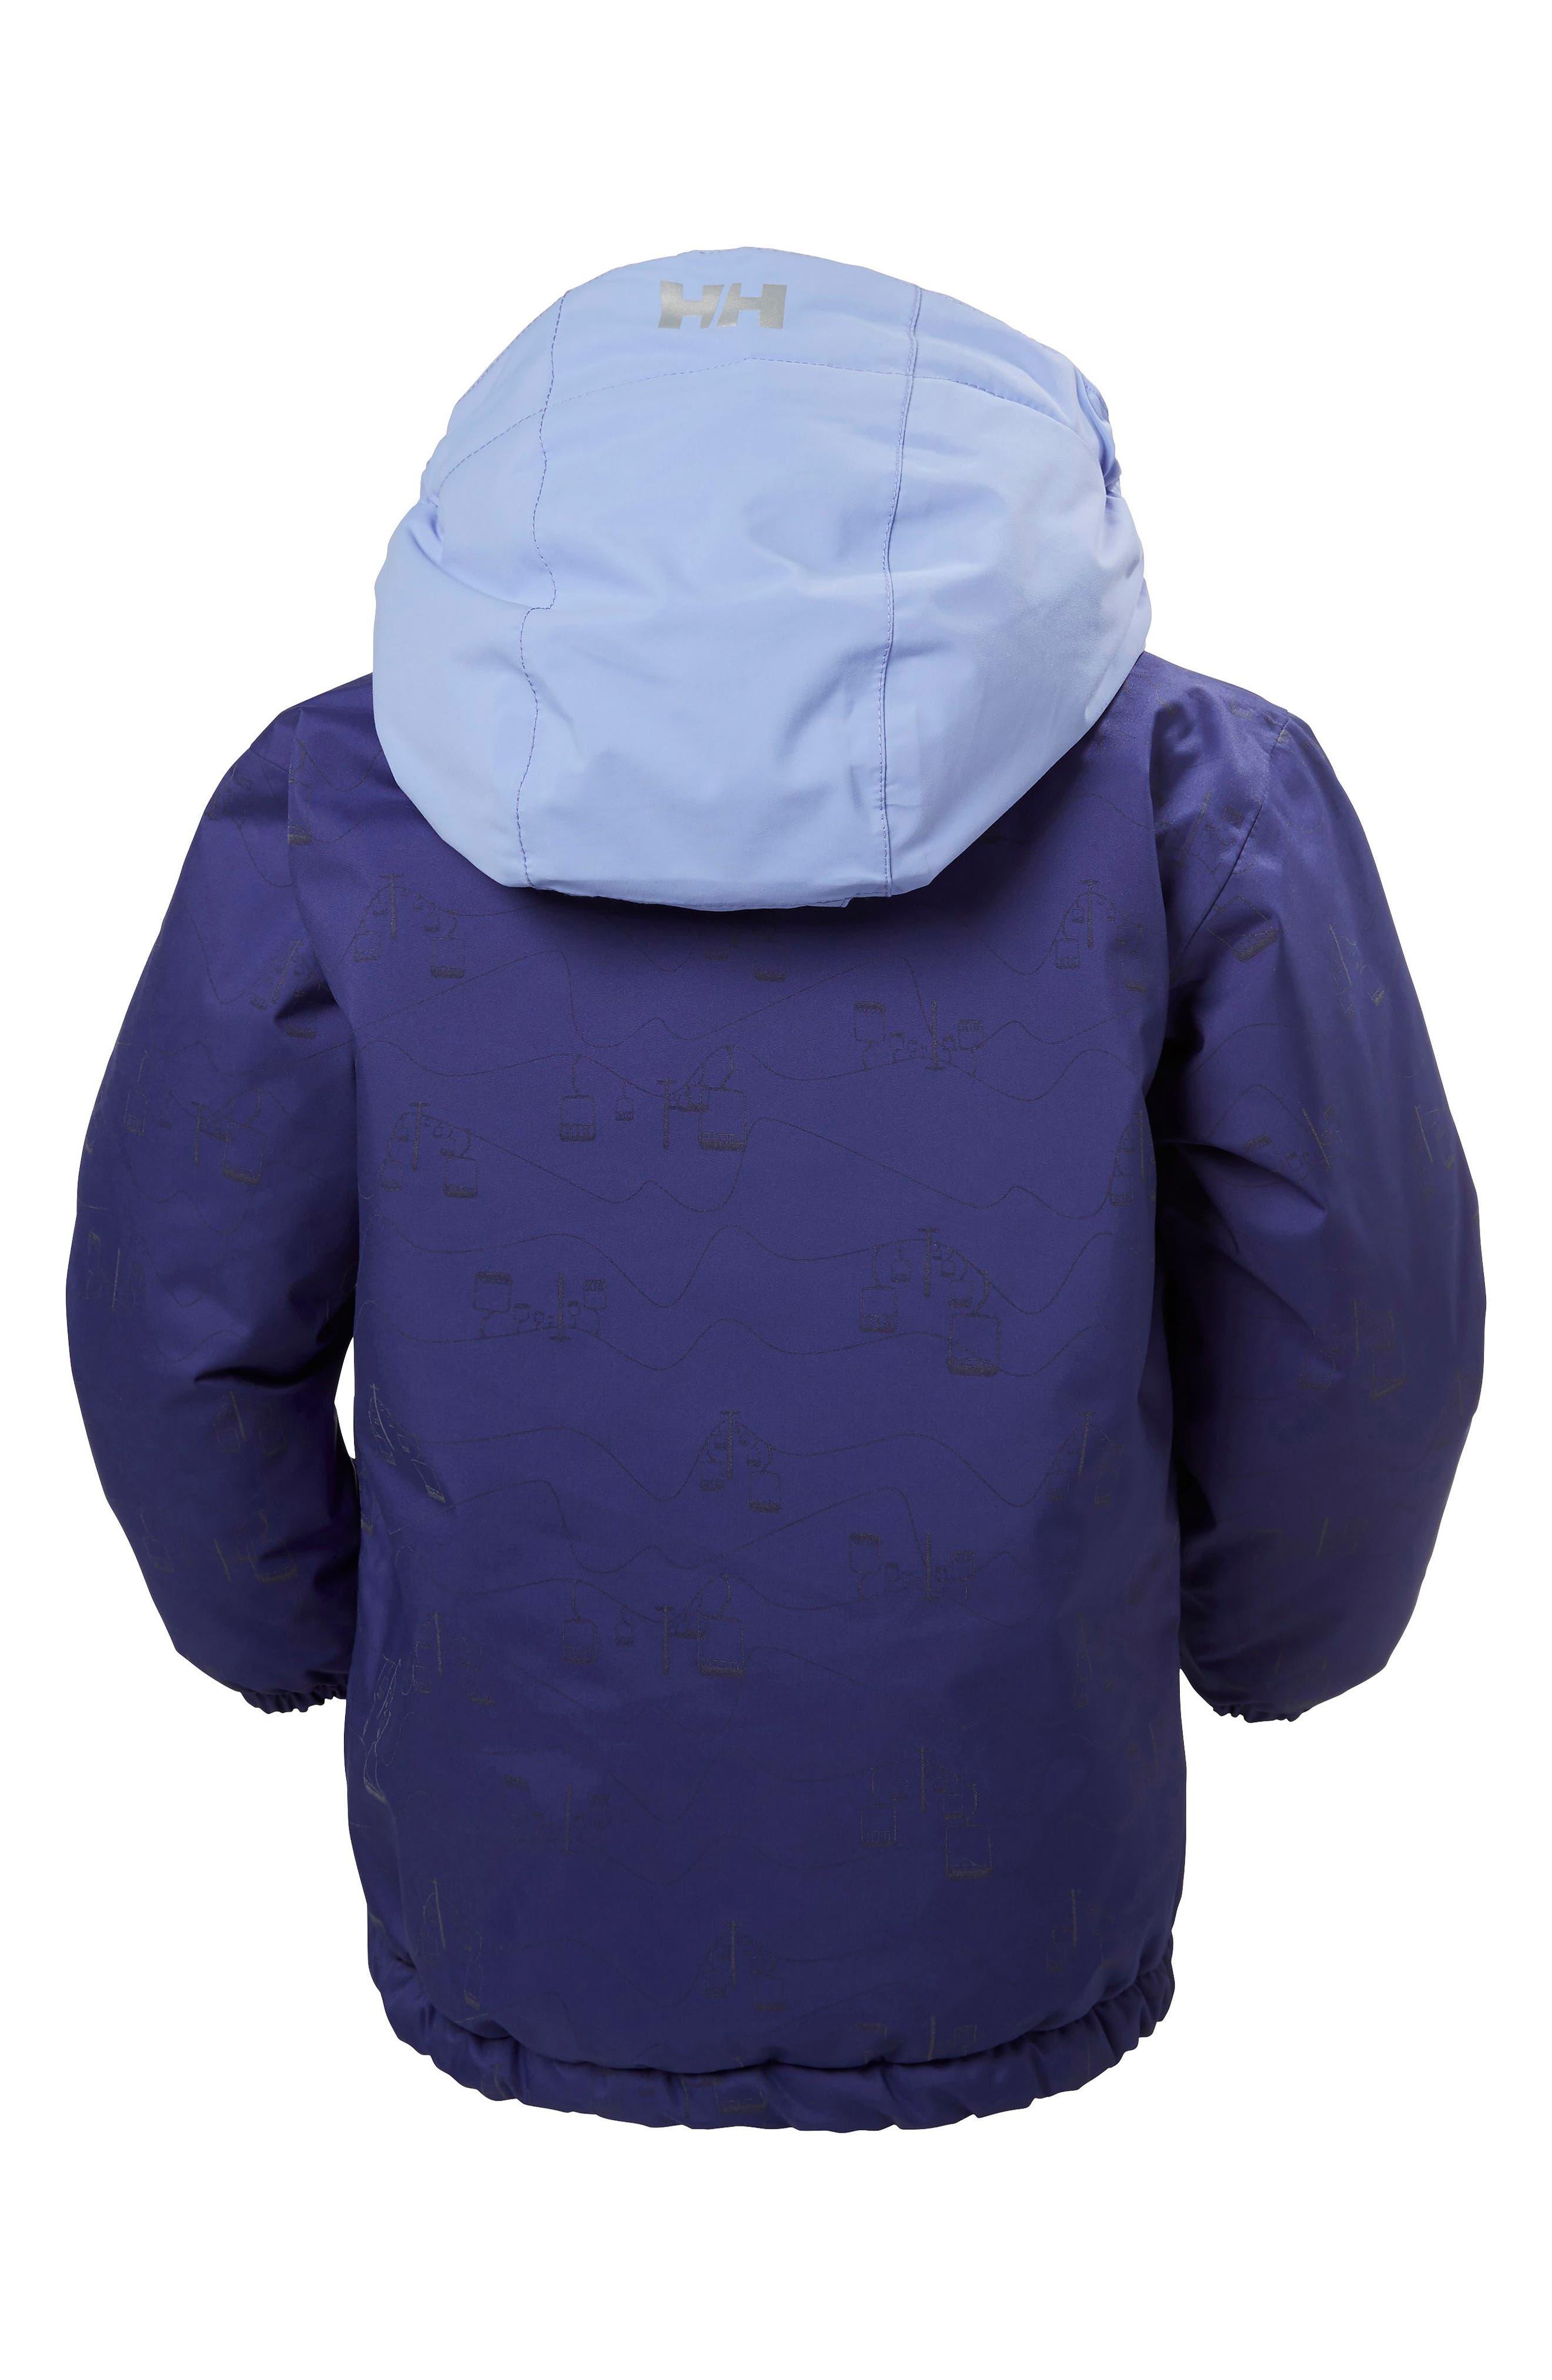 Snowfall Waterproof Insulated Jacket,                         Main,                         color, 548